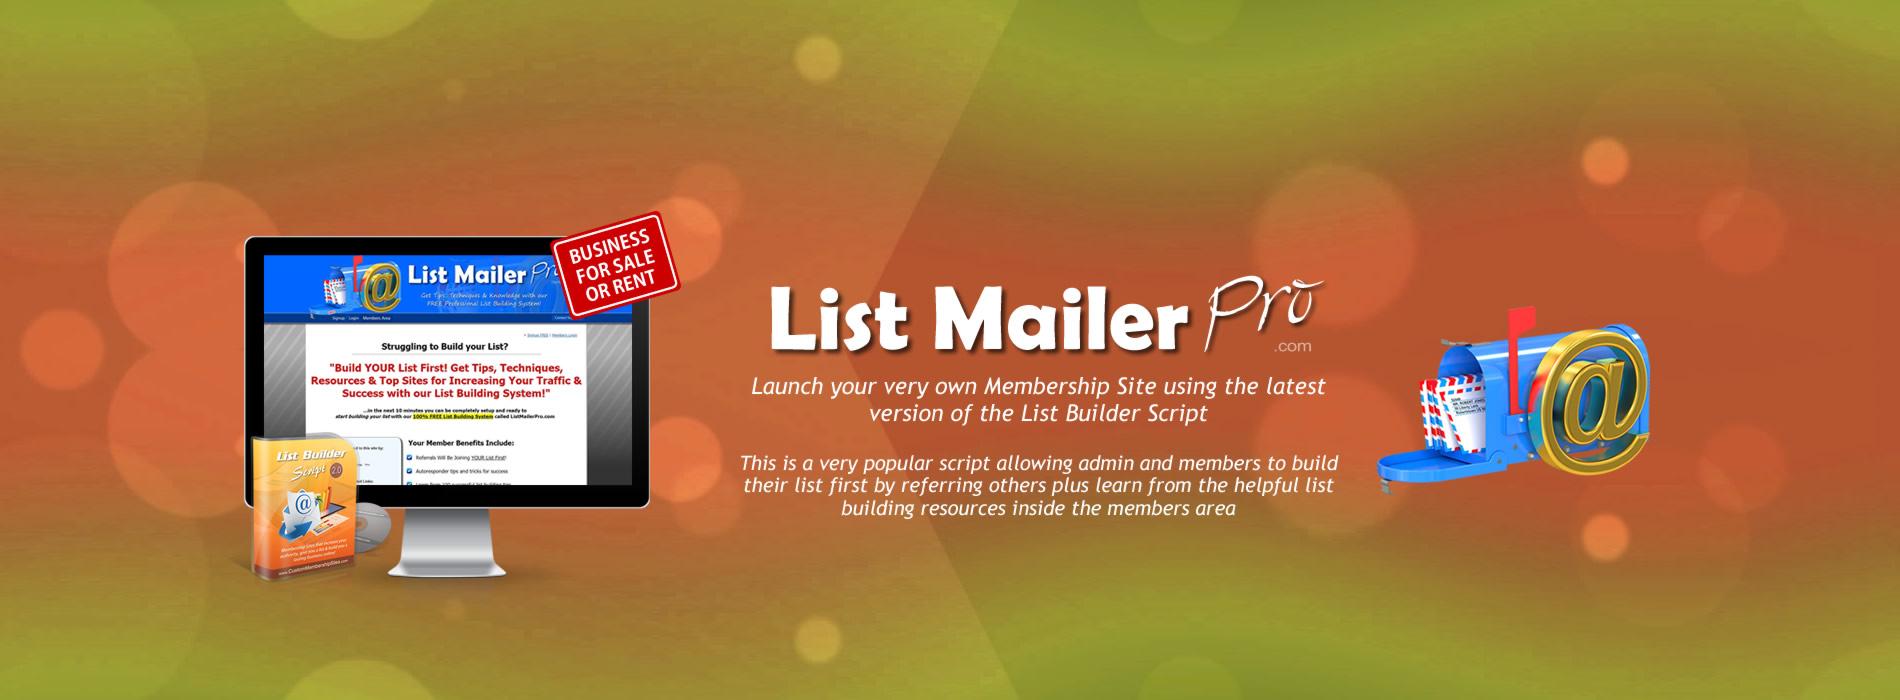 List Mailer Pro